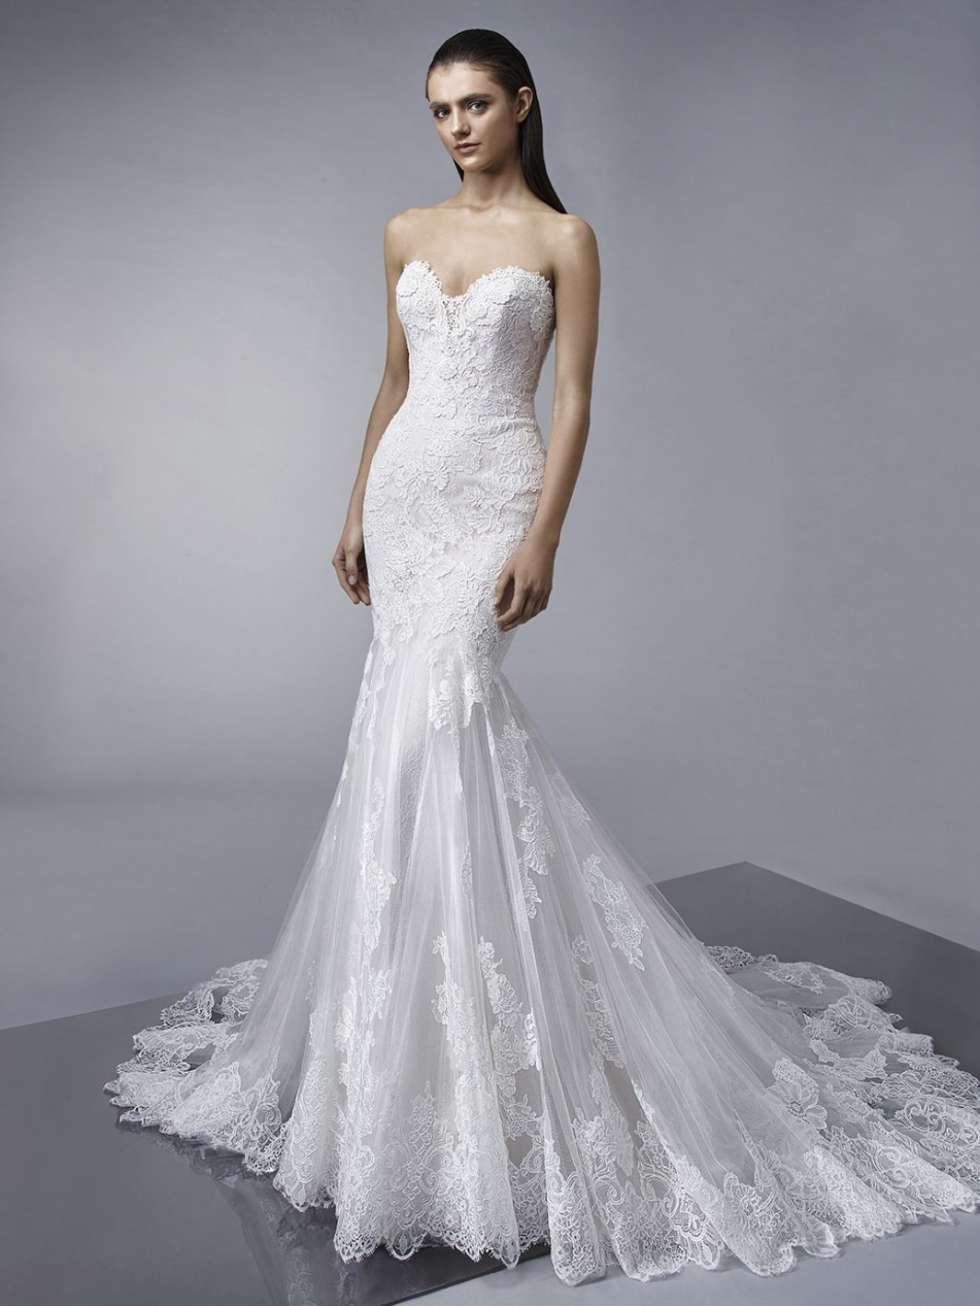 Wedding Dresses By Enzoani 80 Beautiful Enzoani Wedding Dress Collection